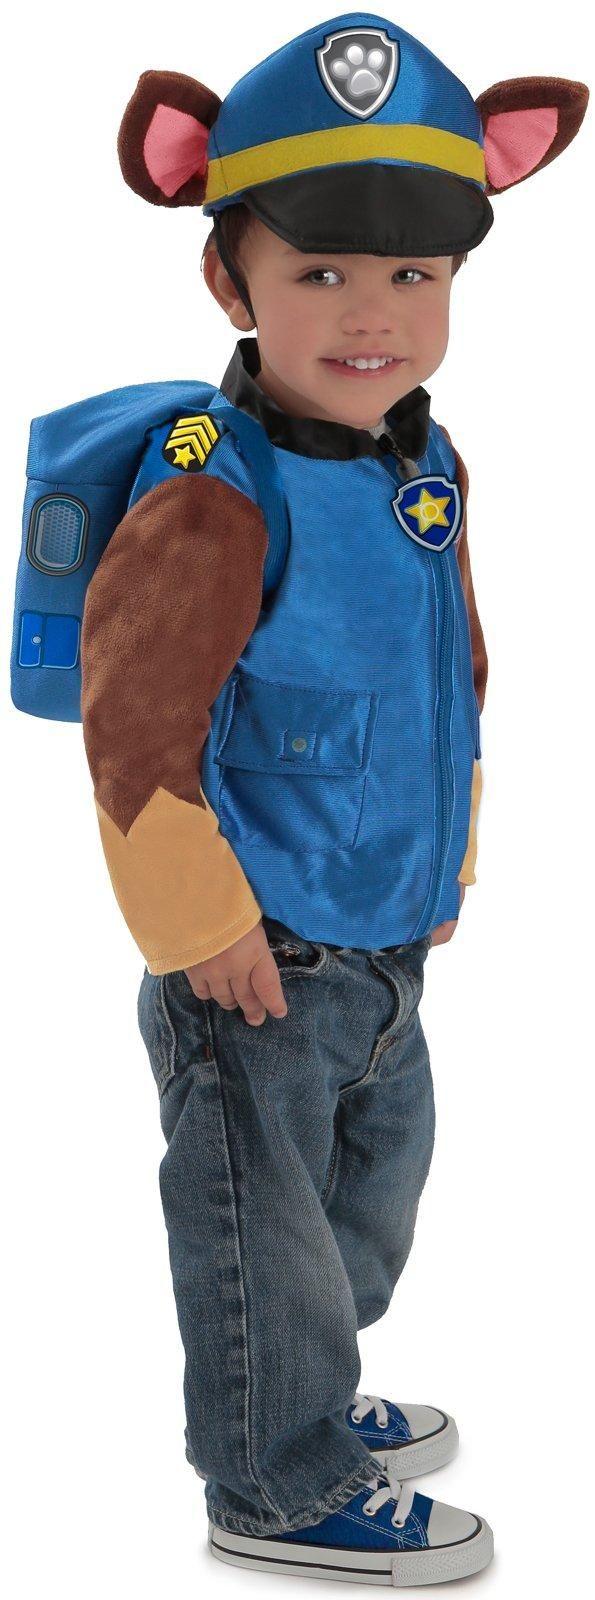 Best 25+ Paw patrol halloween costume ideas on Pinterest | Paw ...